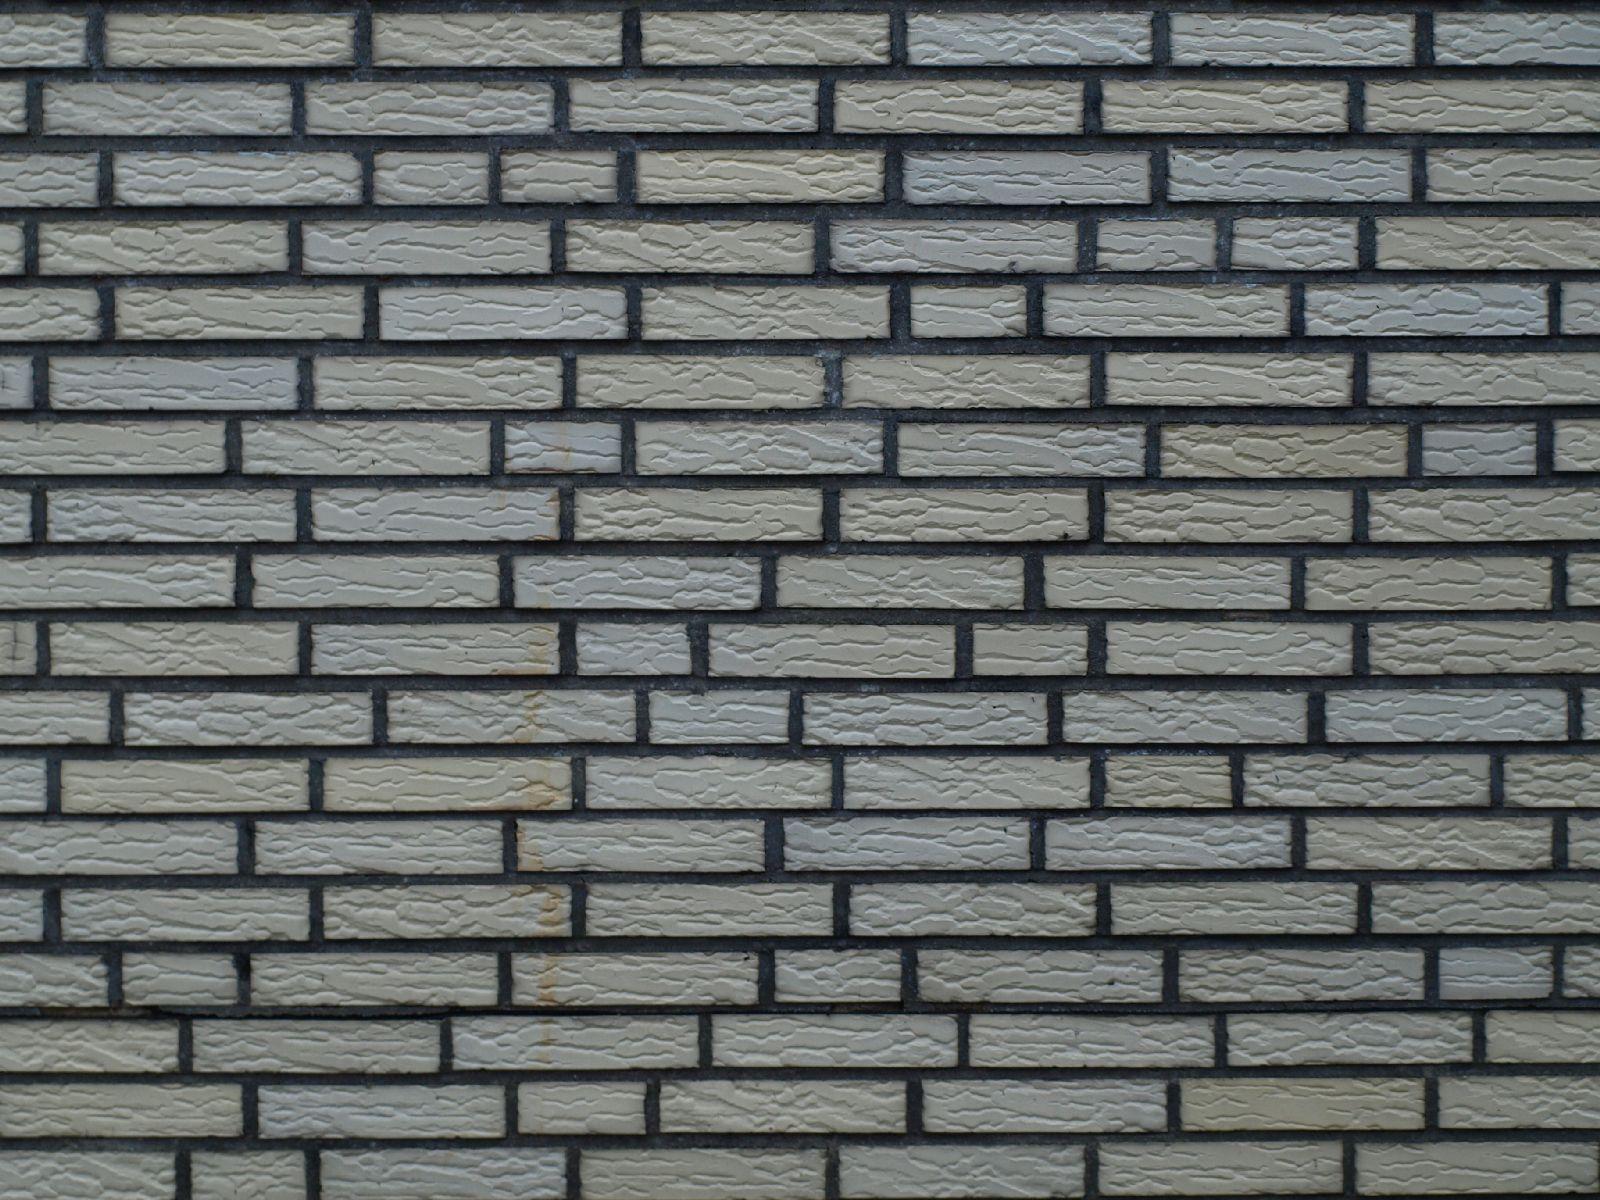 Brick_Texture_A_PC258250